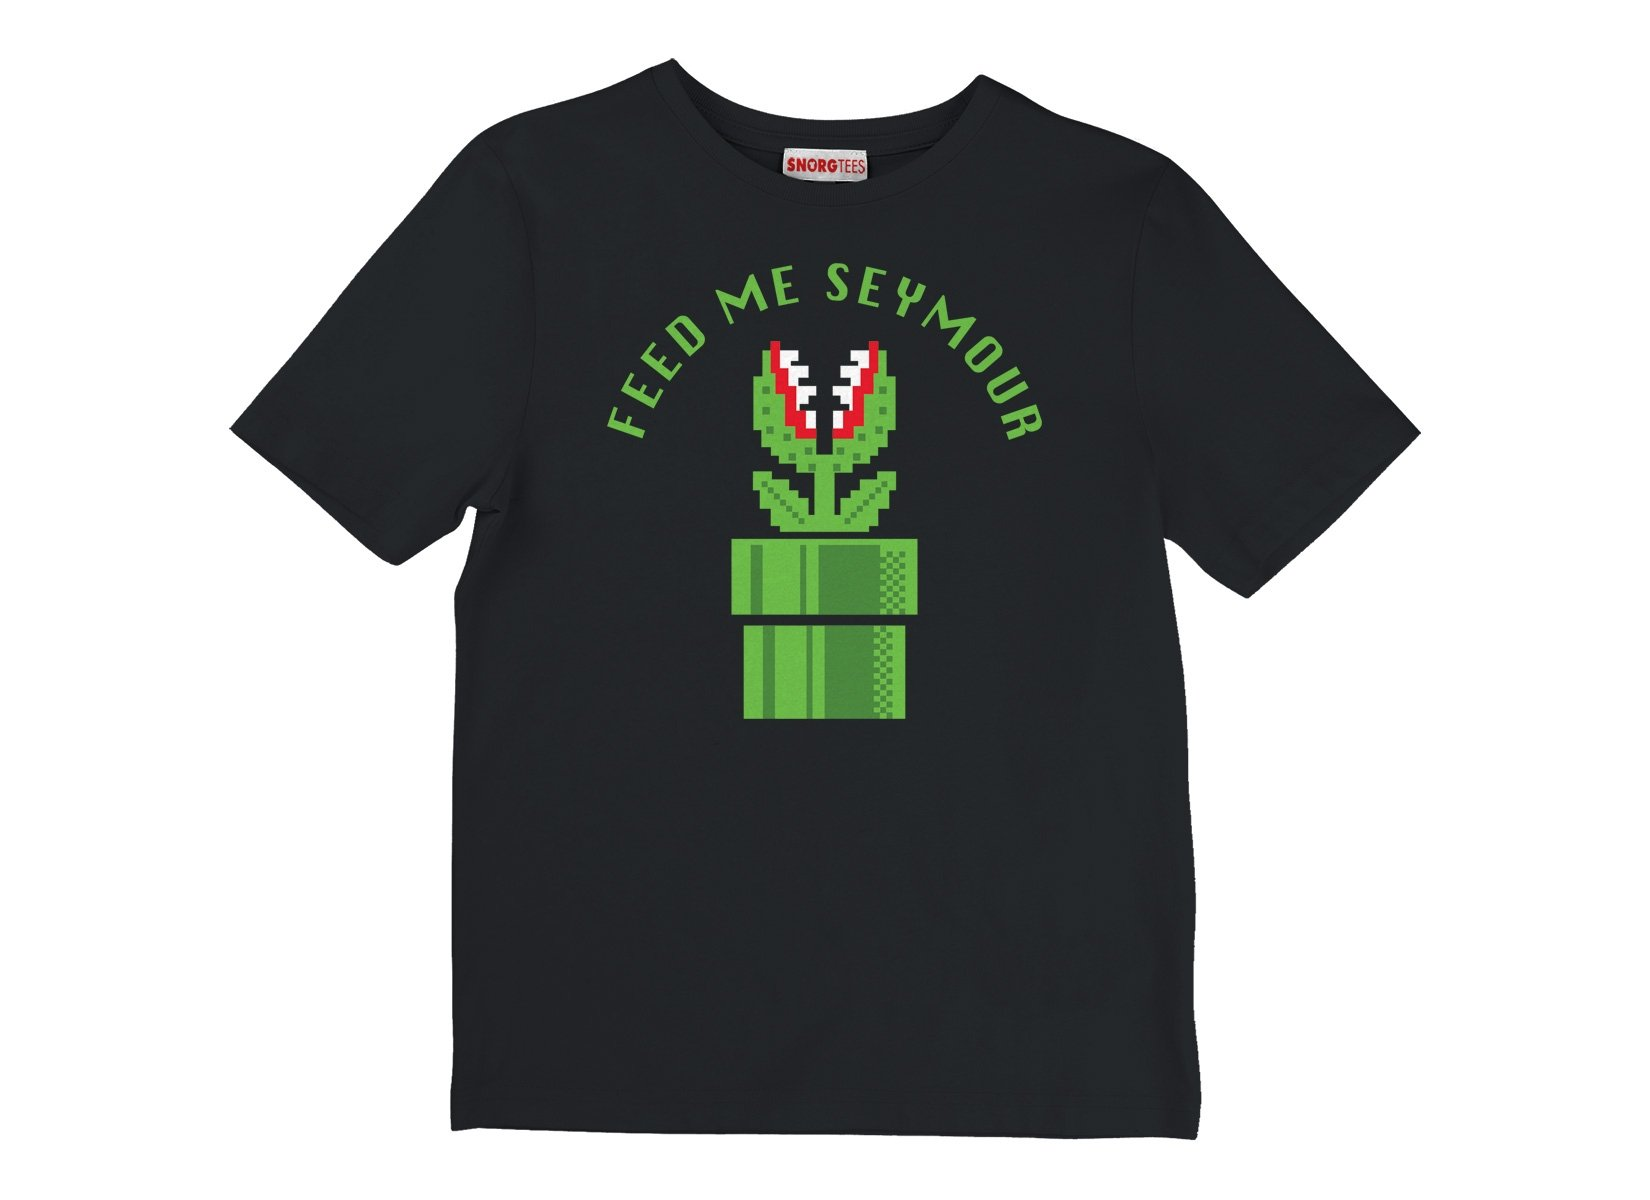 Feed Me Seymour on Kids T-Shirt